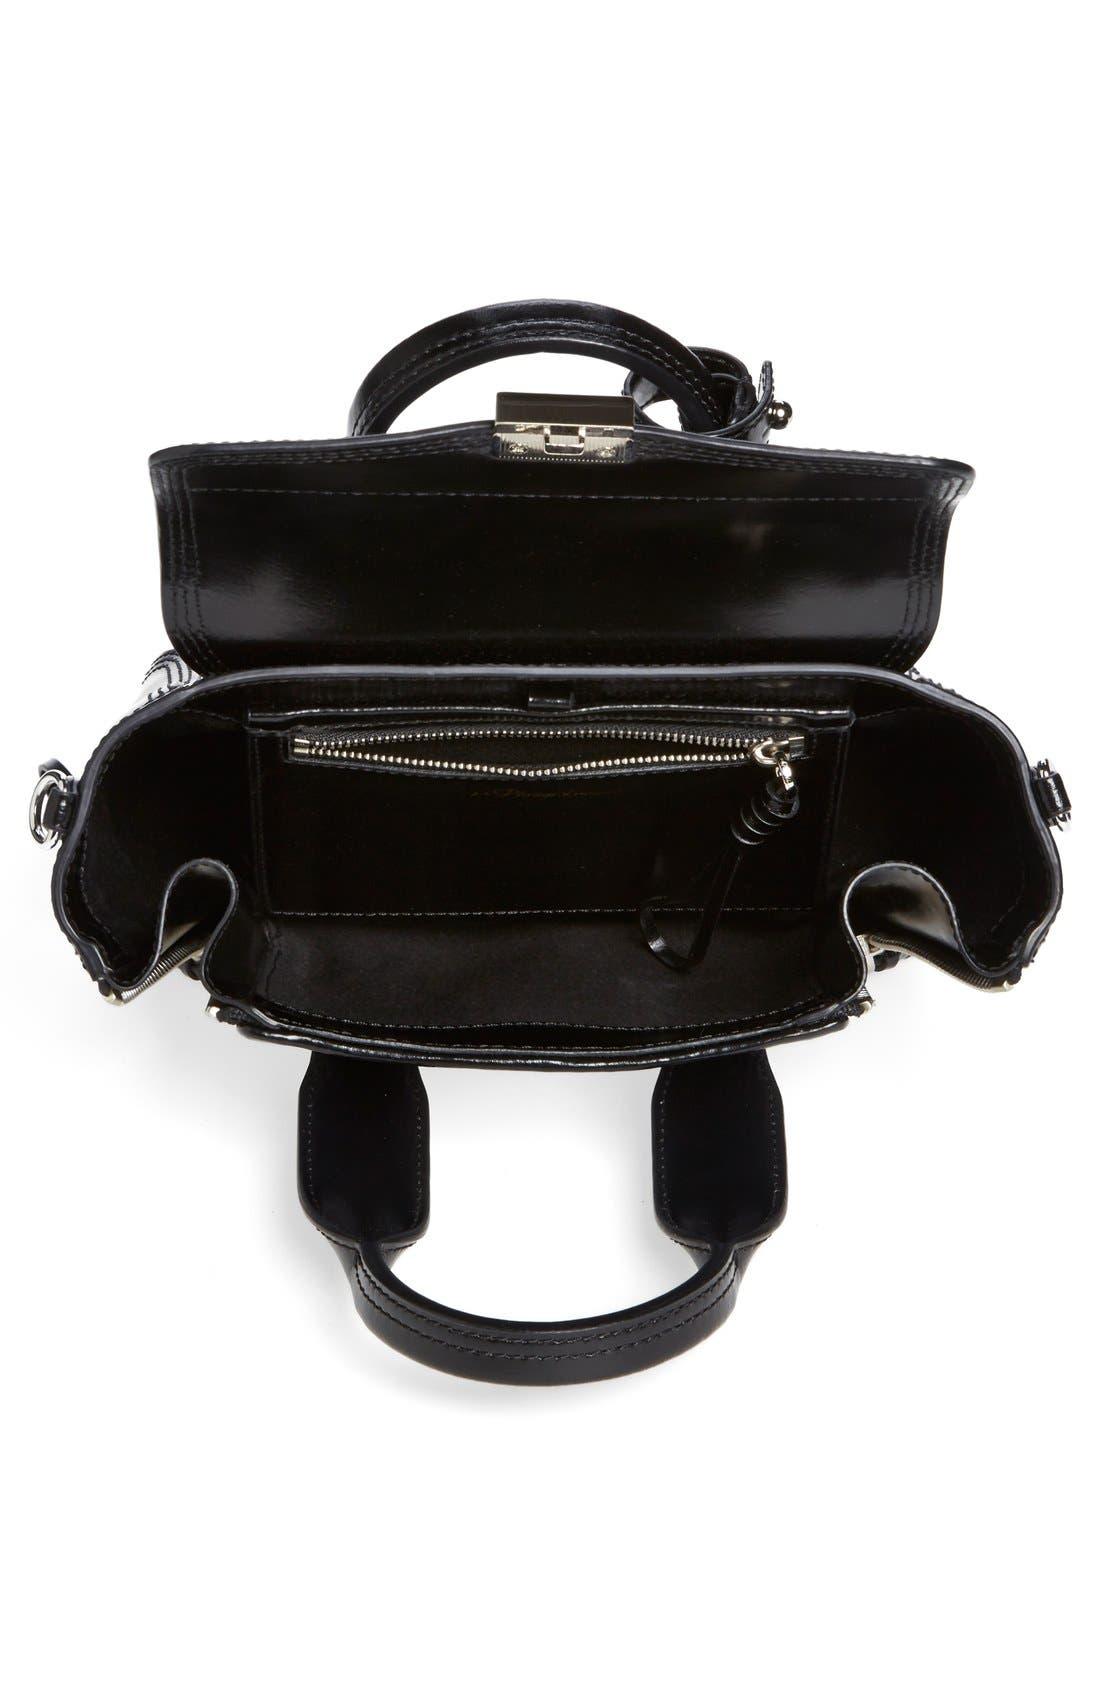 Alternate Image 2  - 3.1 Phillip Lim 'Pashli Mini' Leather & Stingray Satchel